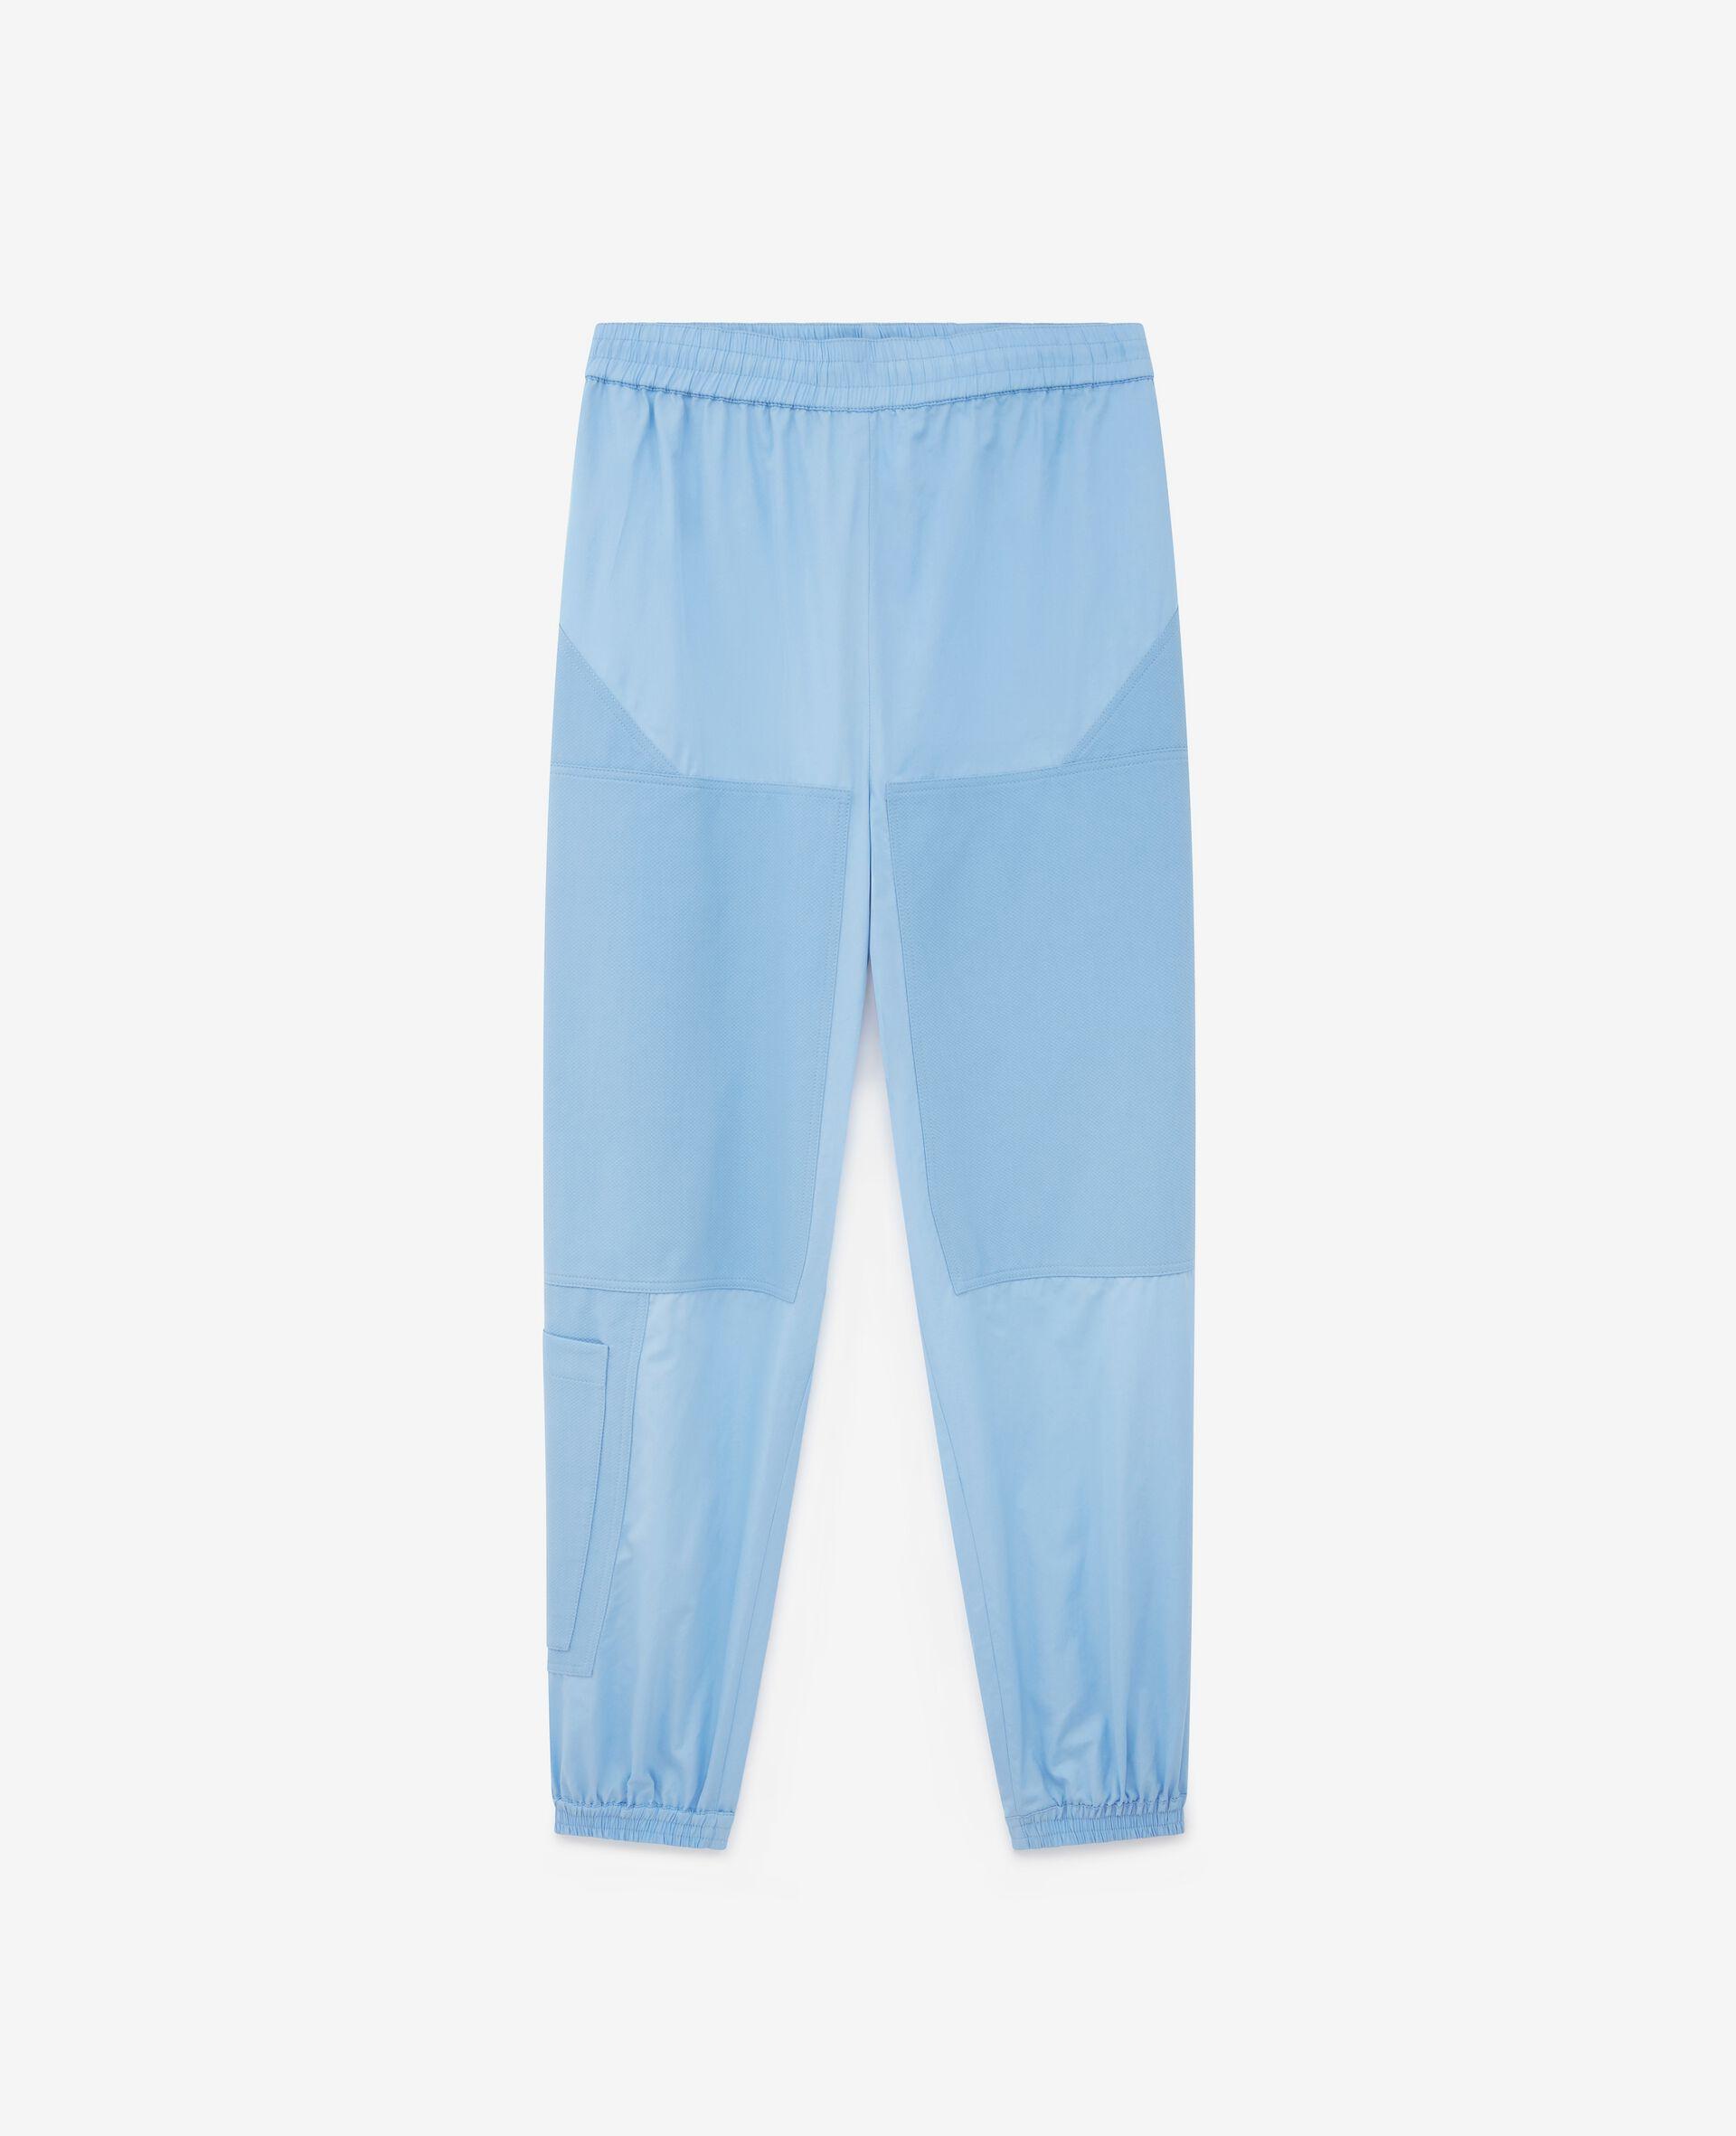 Kara Trousers-Blue-large image number 0